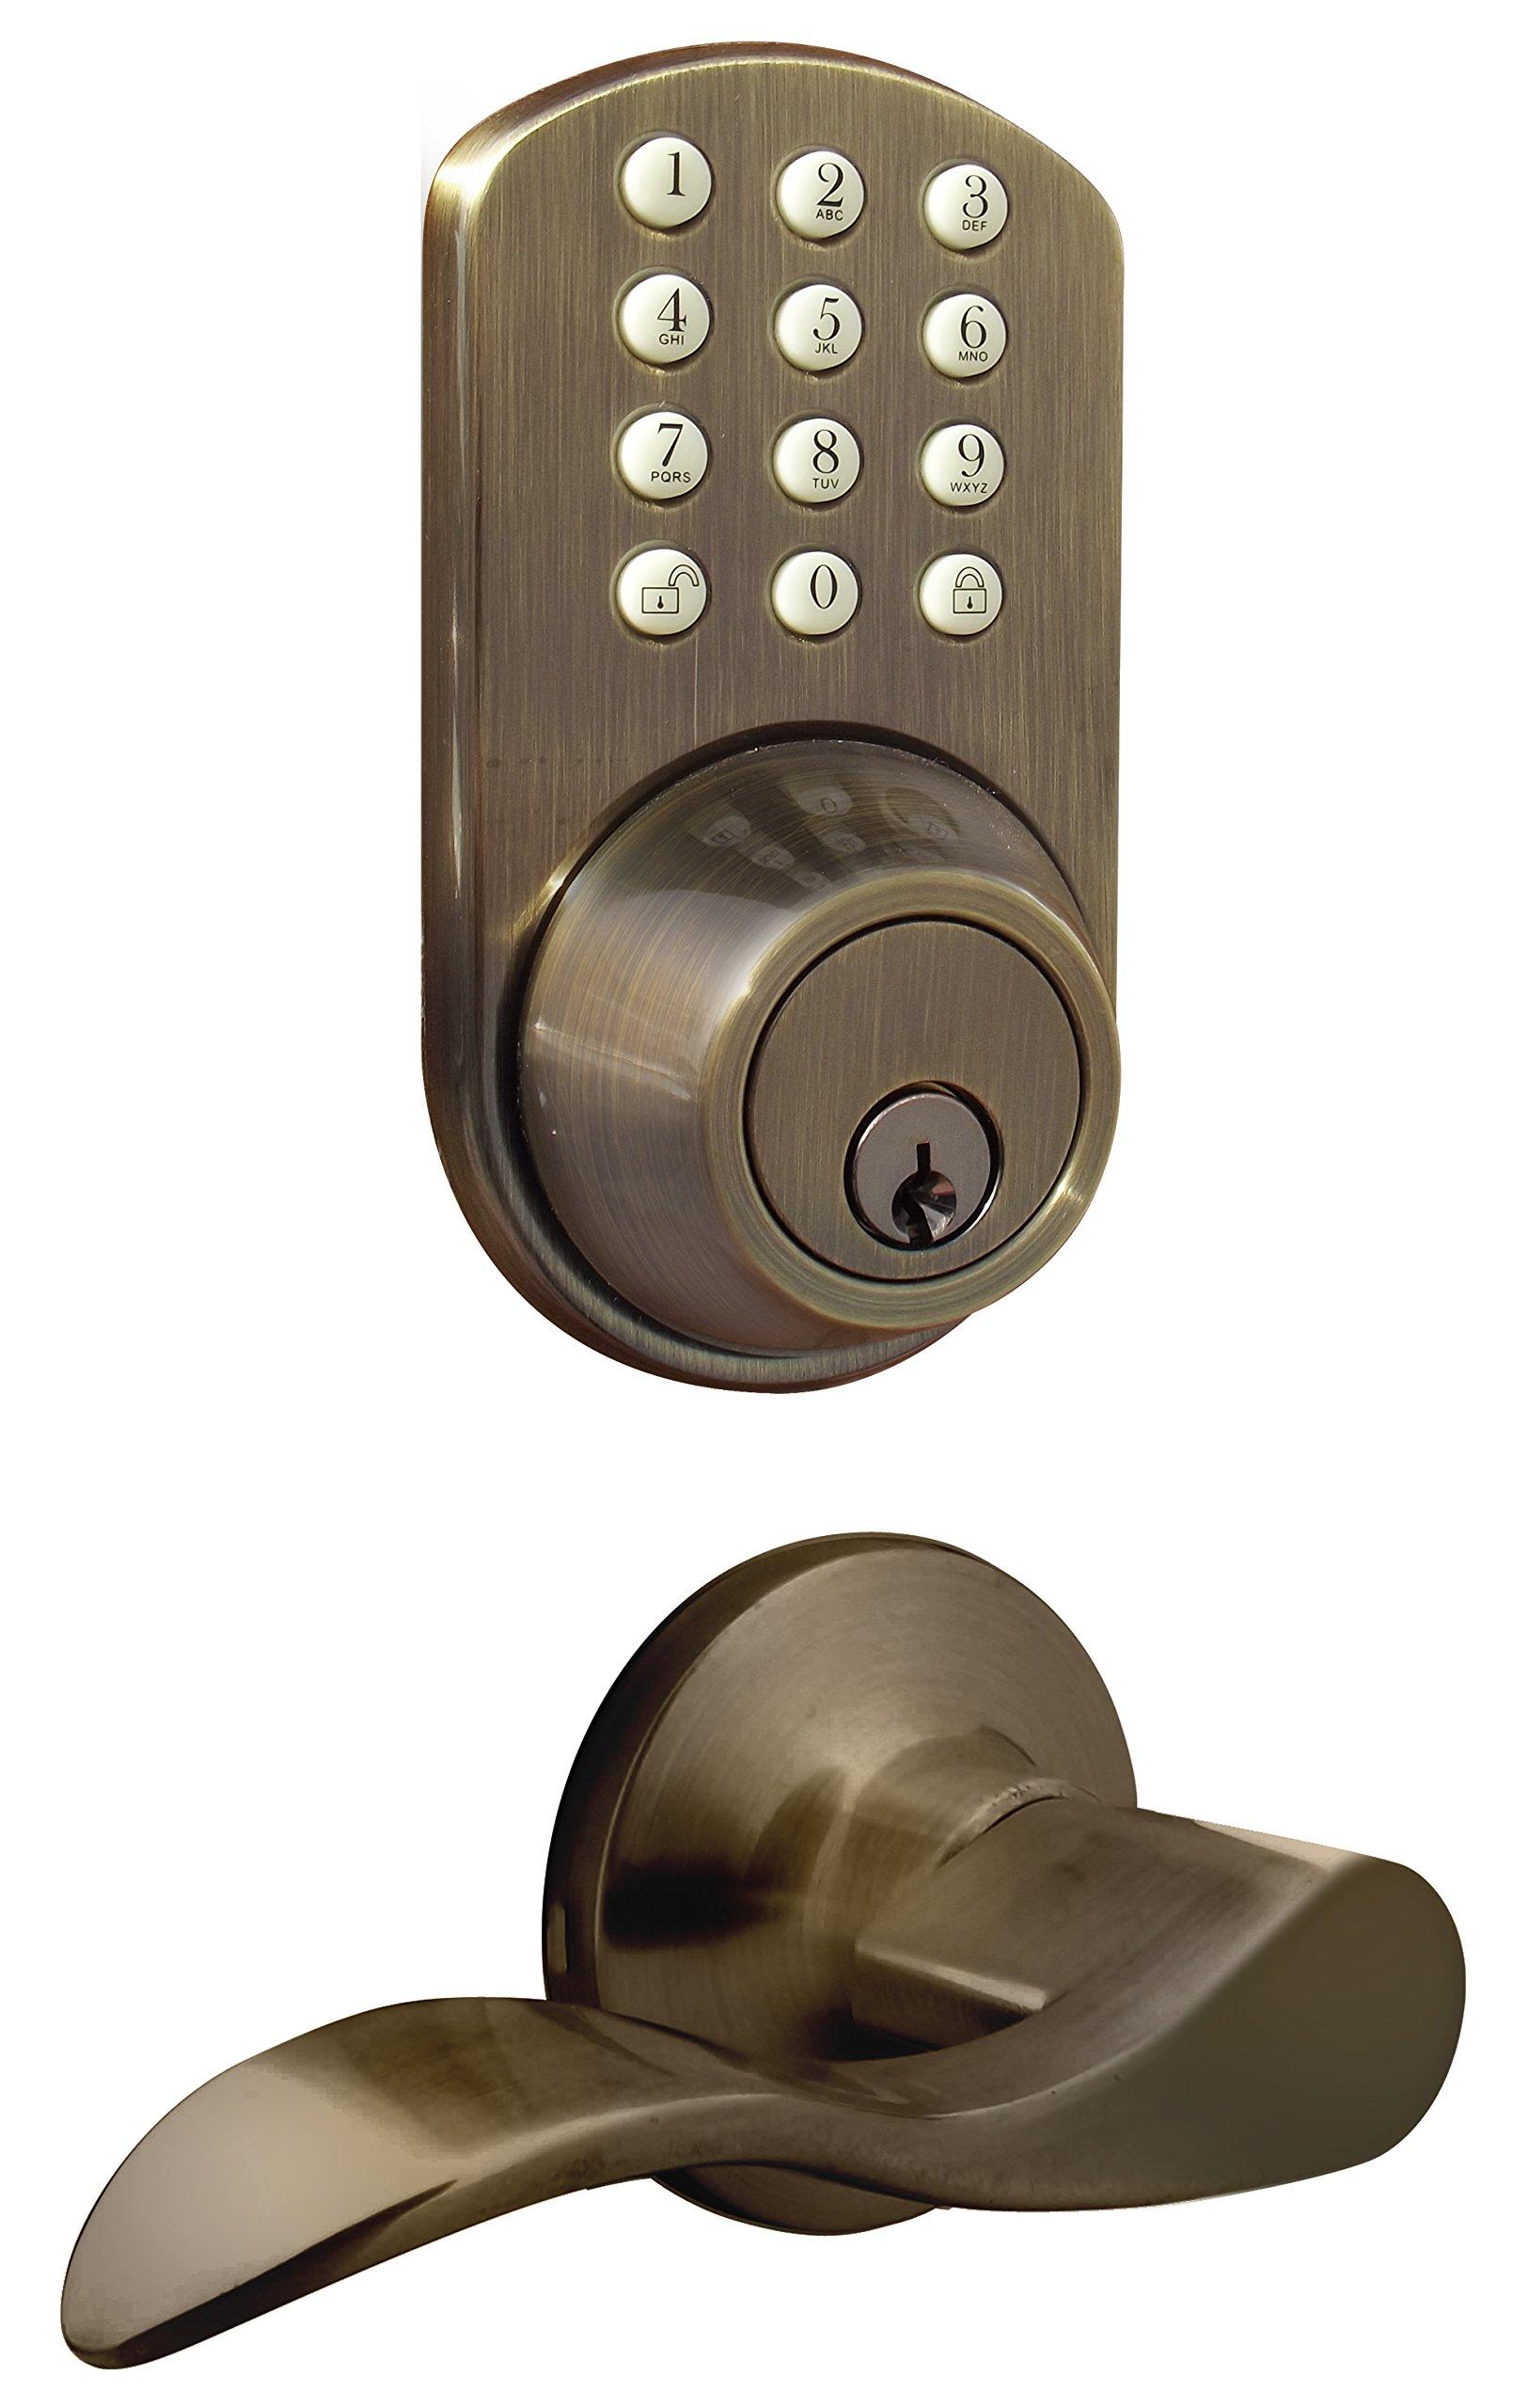 MiLocks TFL-02AQ Digital Deadbolt Door Lock and Passage Lever Handle Combo with Keyless Entry via Keypad Code for Exterior Doors, Antique Brass